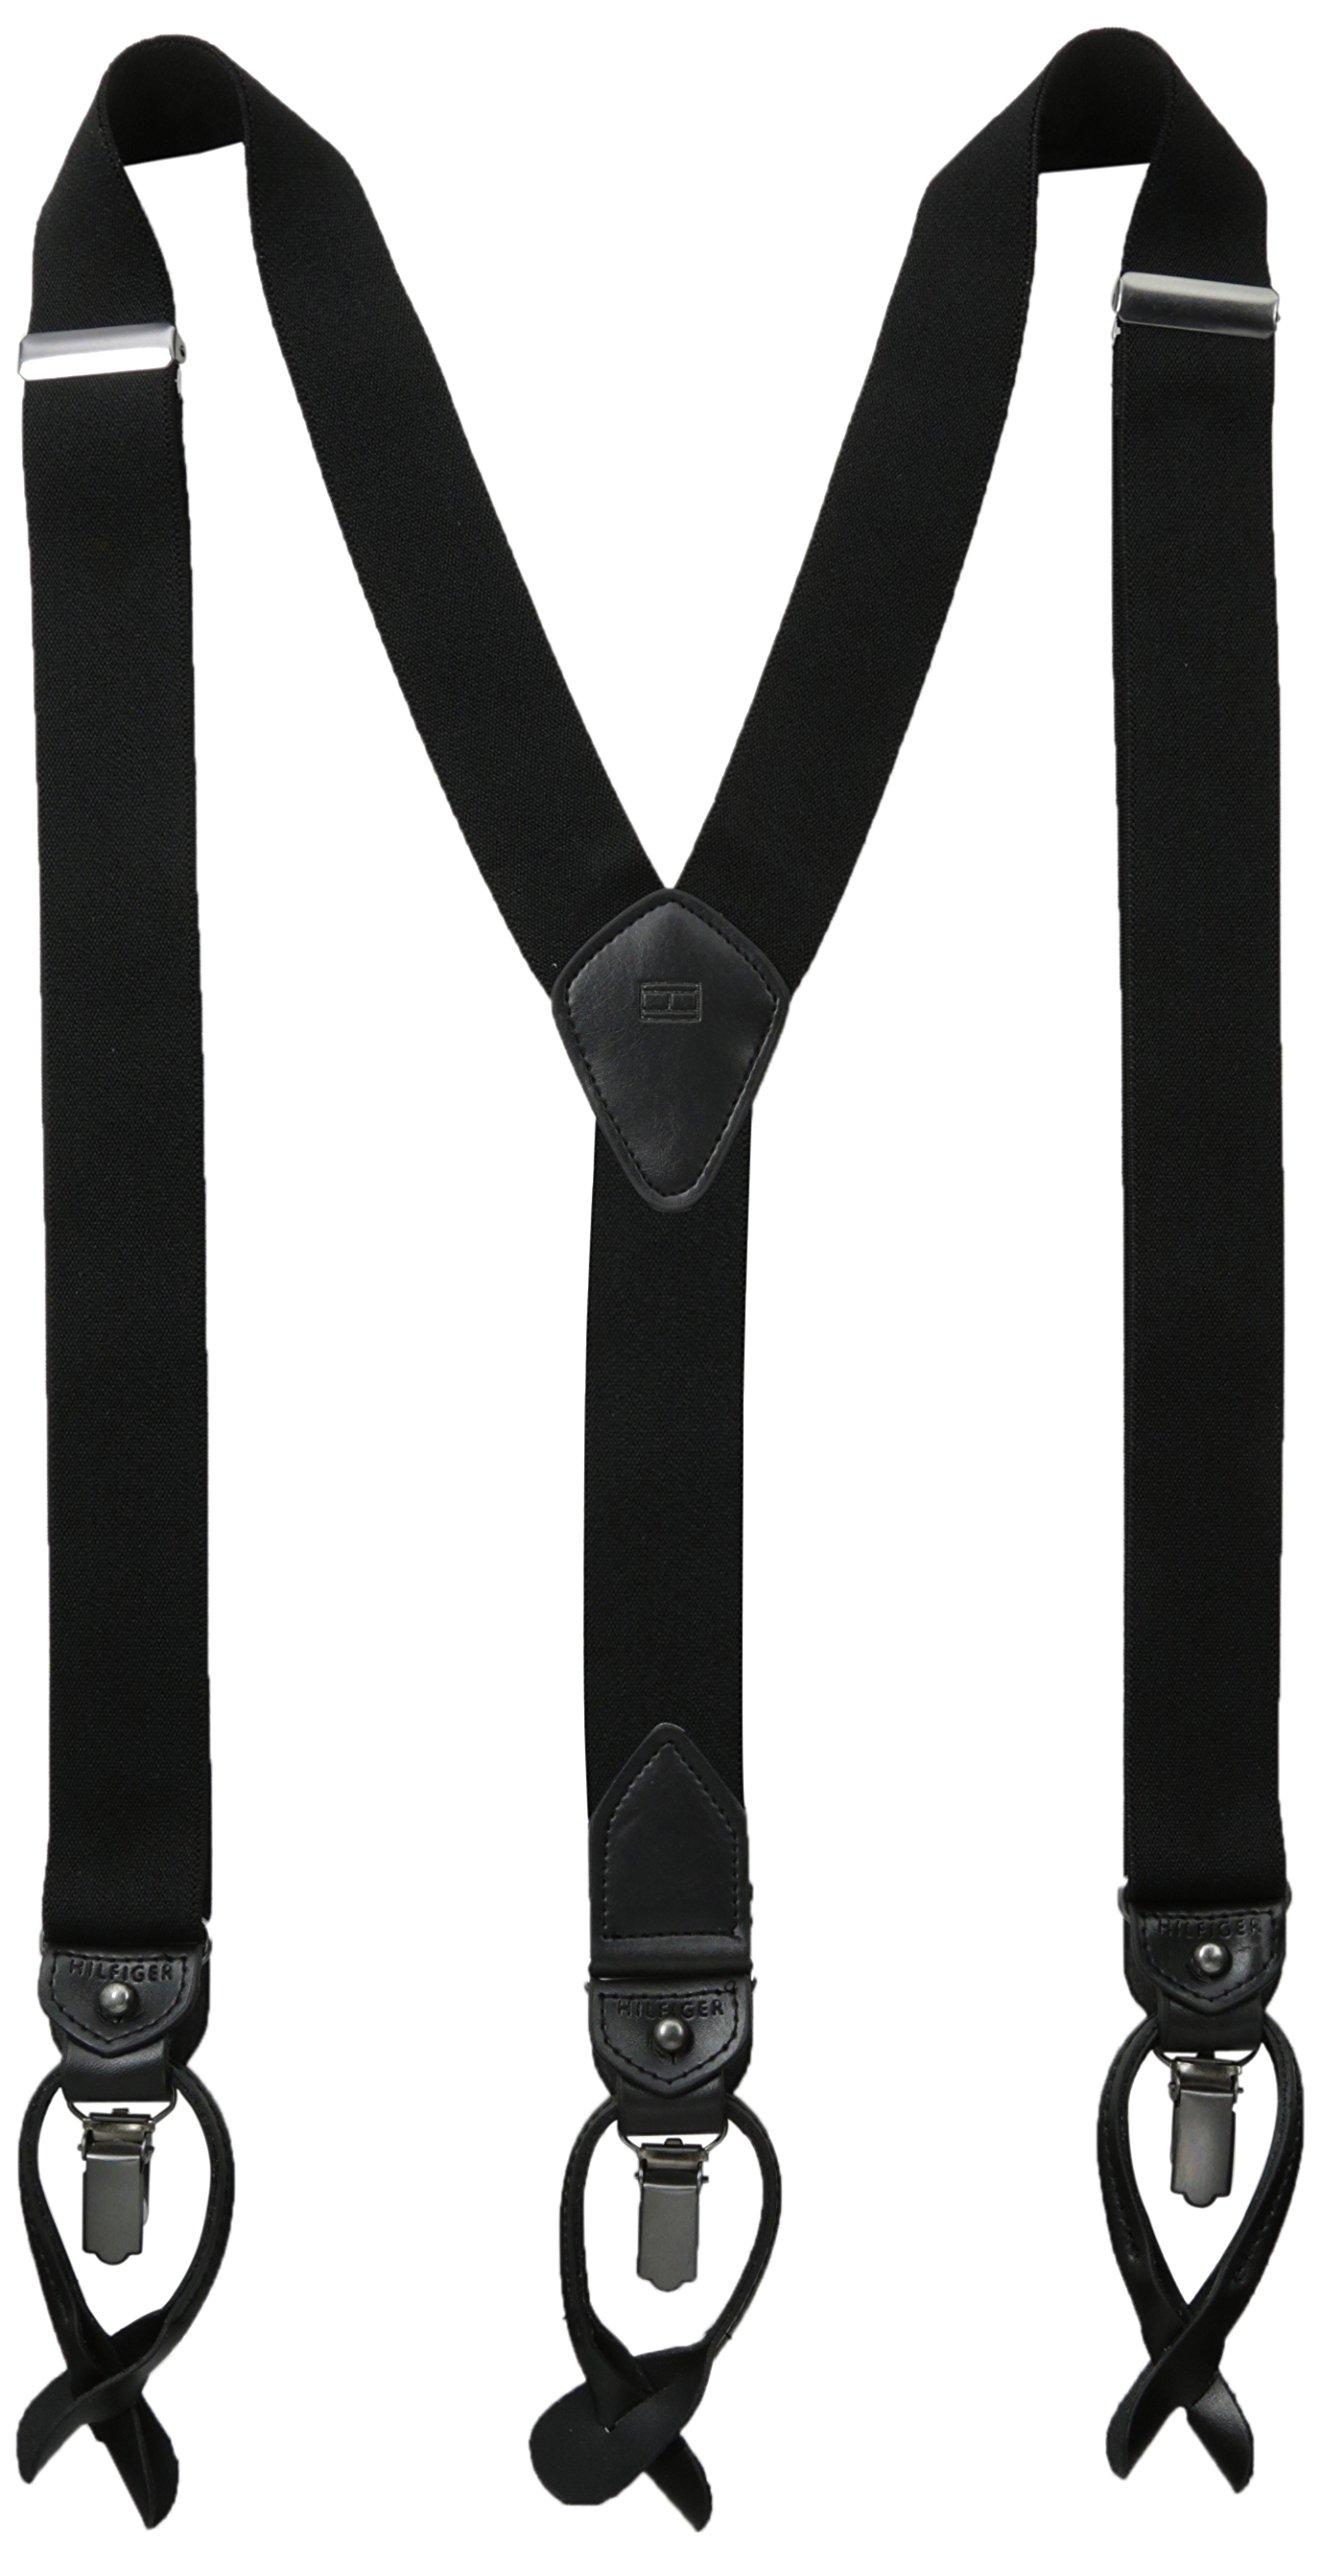 Tommy Hilfiger Suspenders Black sizee